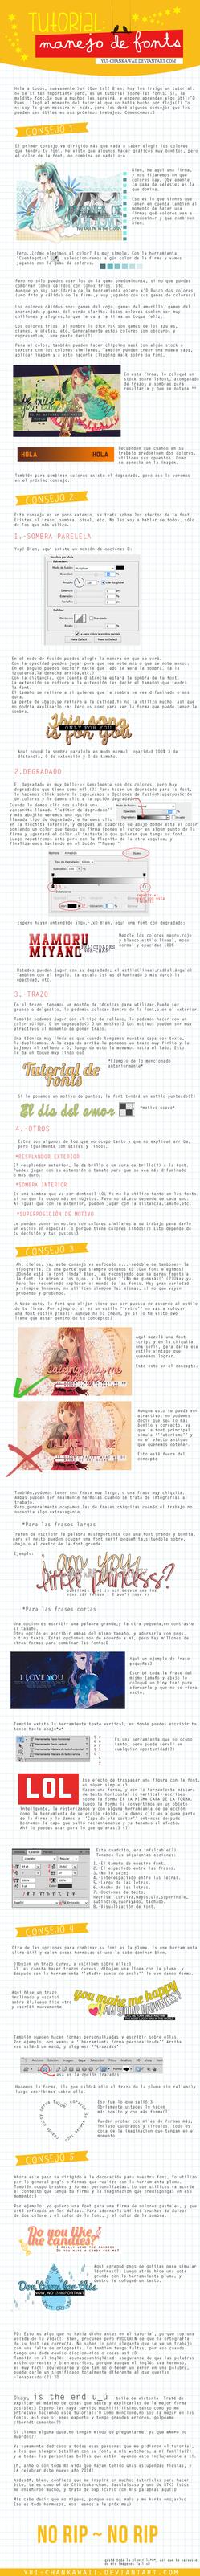 Tutorial Manejo de Font by Yui-chanKawaii